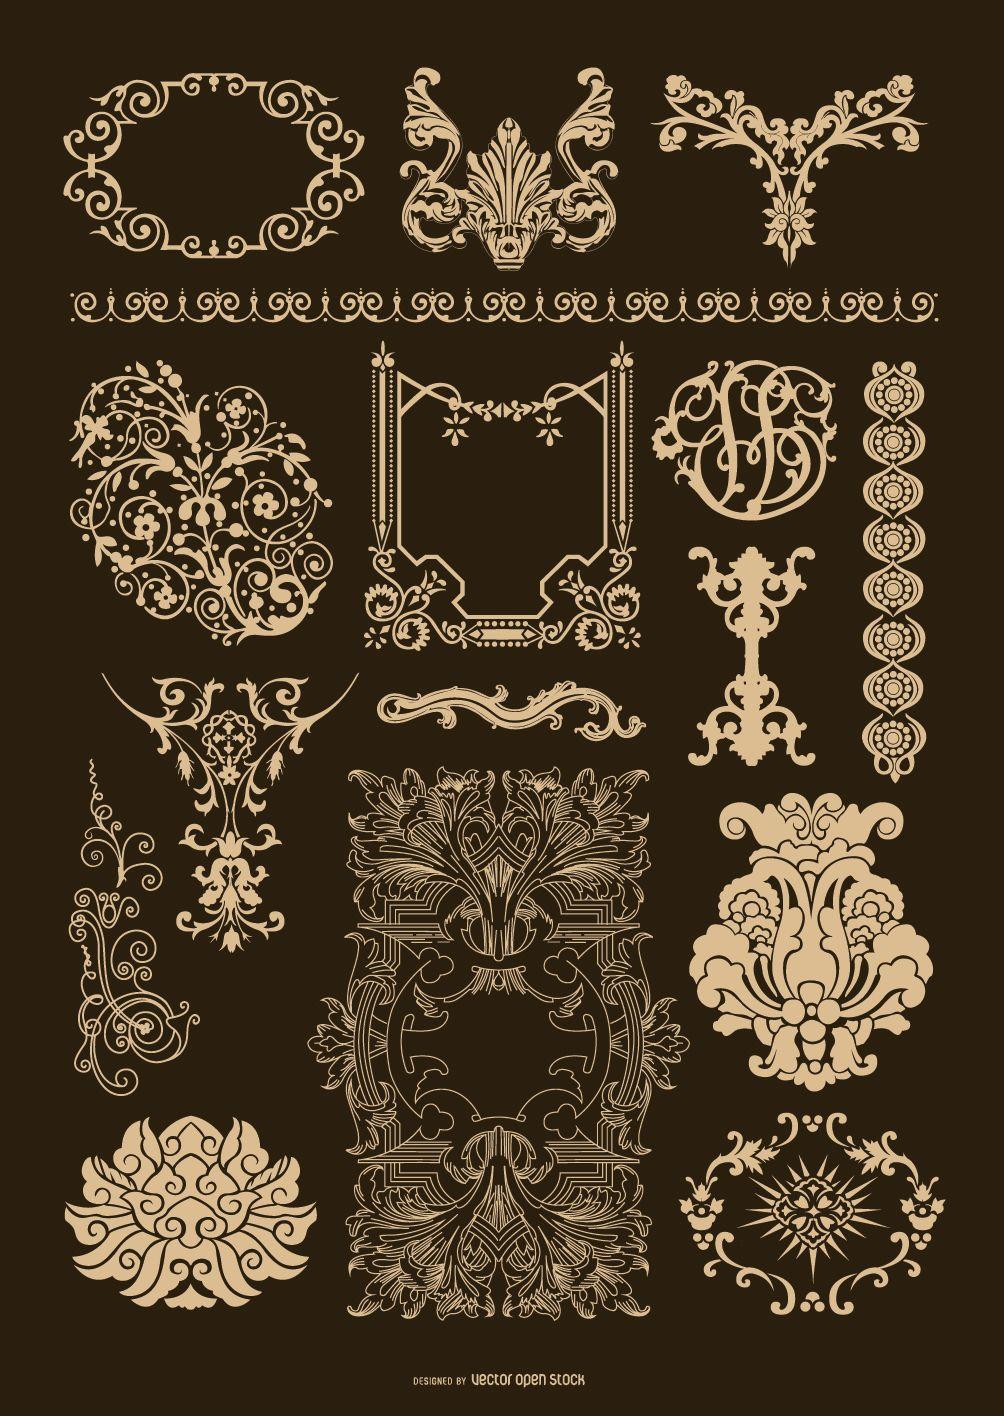 This Set Includes Quite A Few Cool Antique Ornamentation